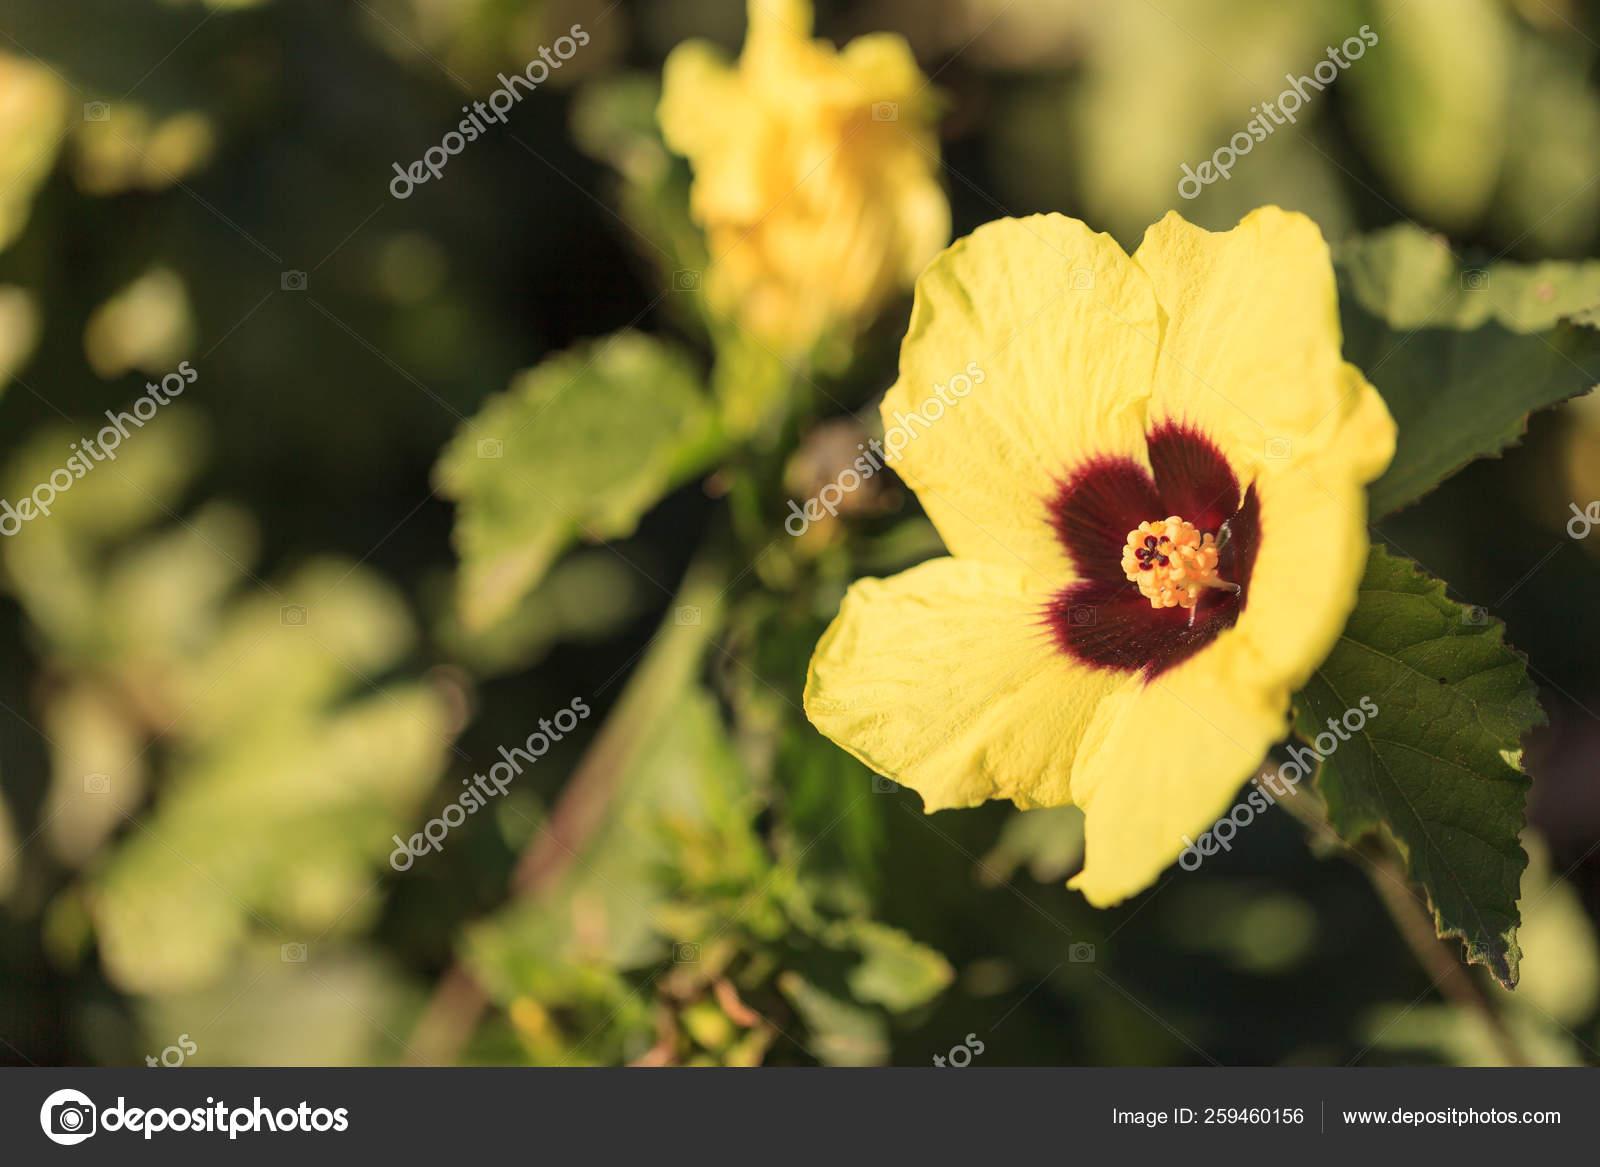 Yellow Red Hibiscus Flower Detailed Stamen Pistil Hawaiian Garden